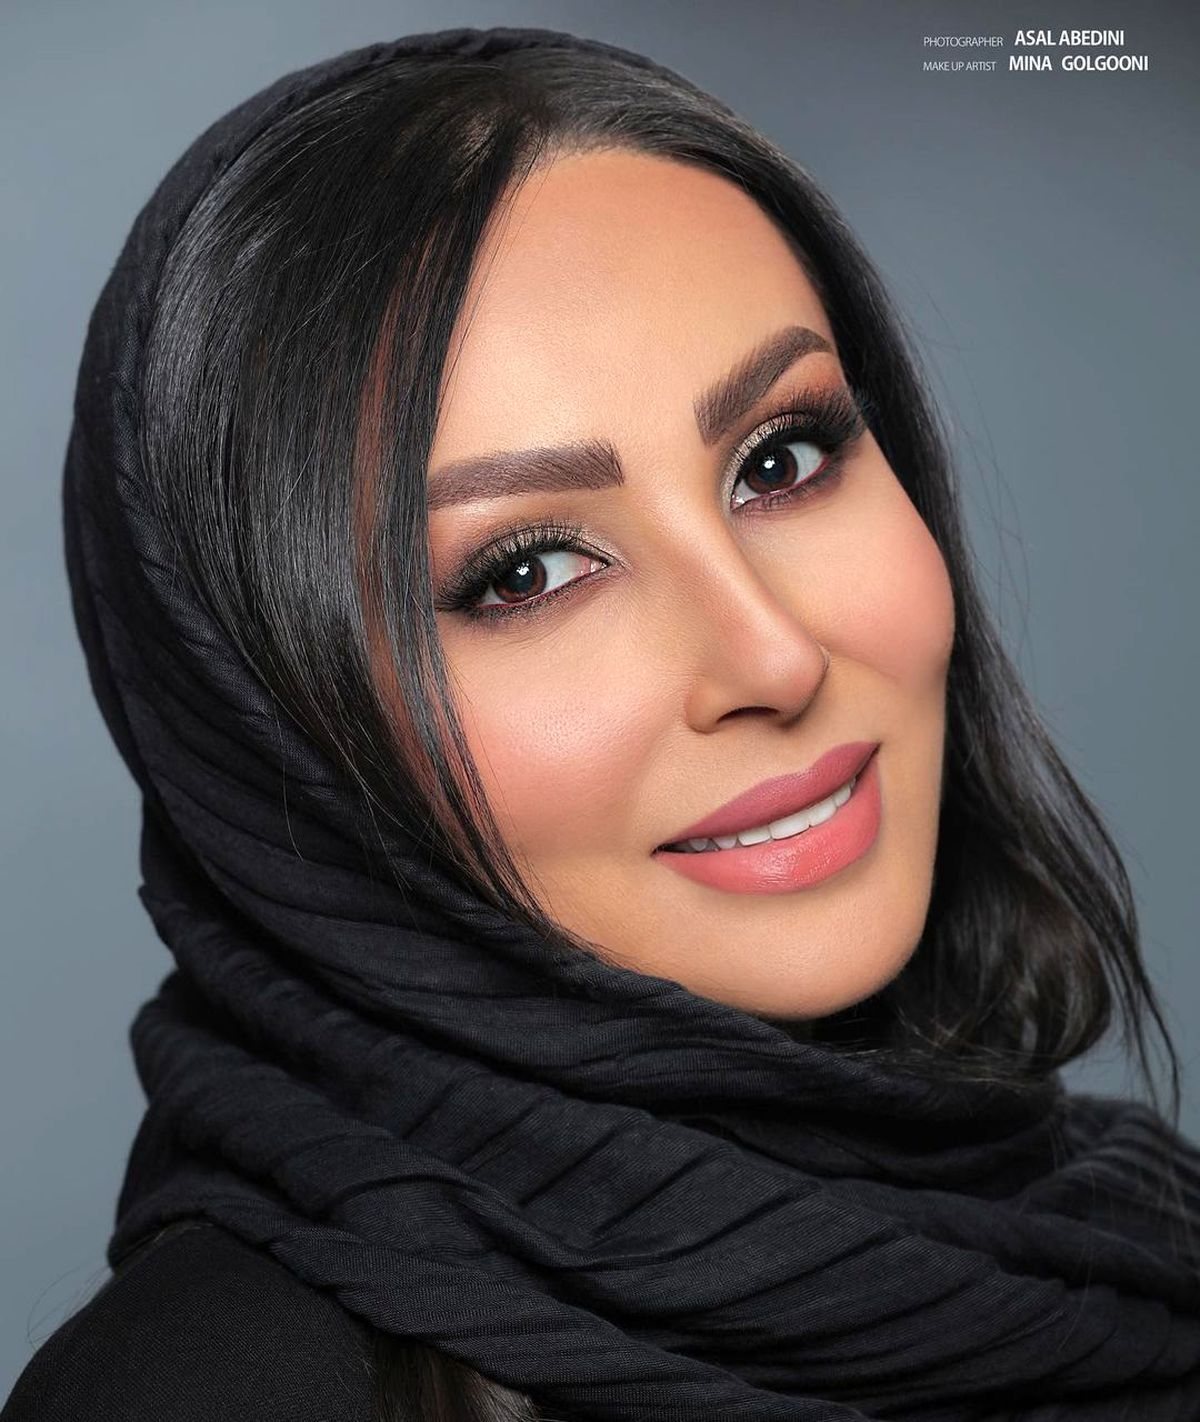 ویدیو اعتراف تلخ پرستو صالحی درباره دلیل مهاجرتش | «دیگر دغدغه حجاب ندارم»